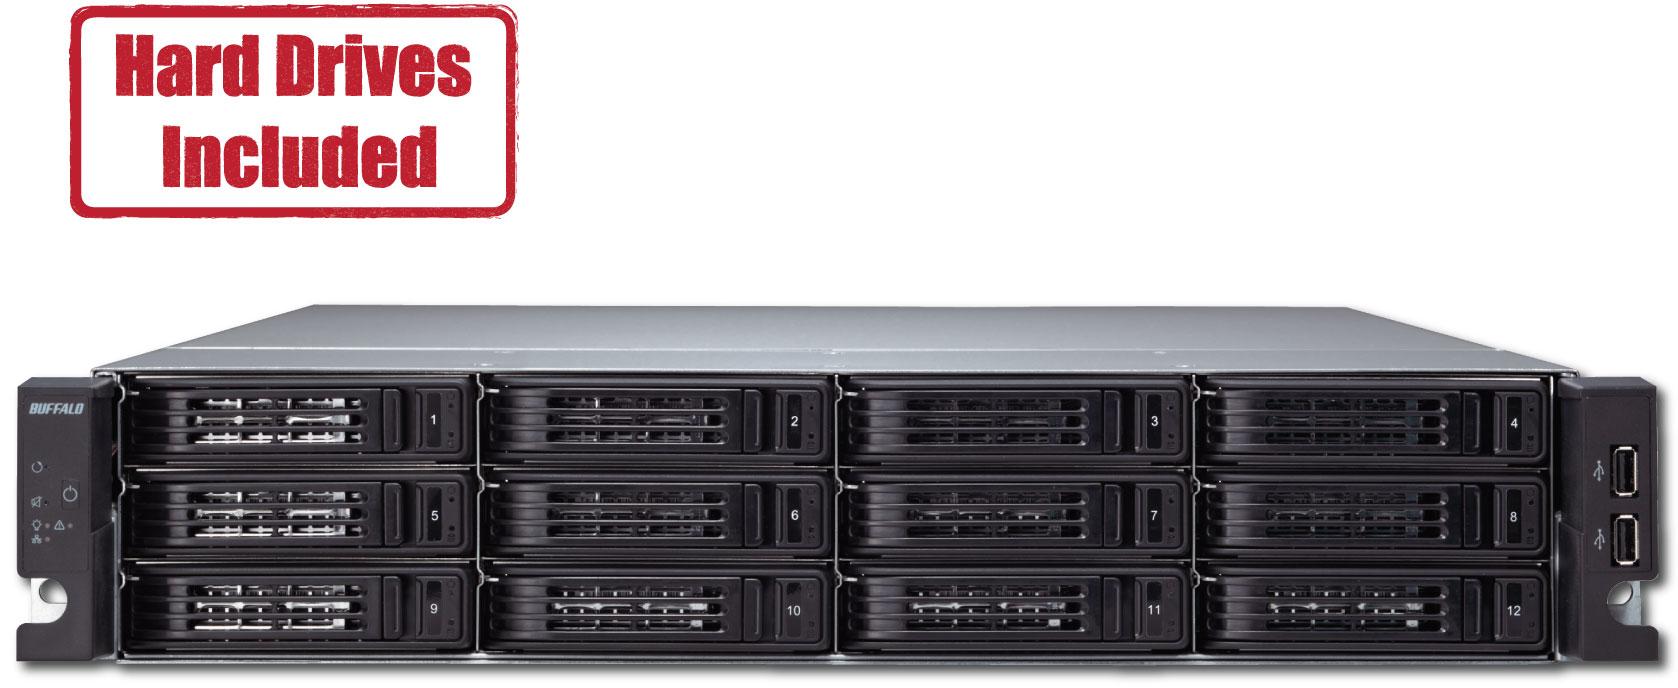 TeraStation™ 7000 Series